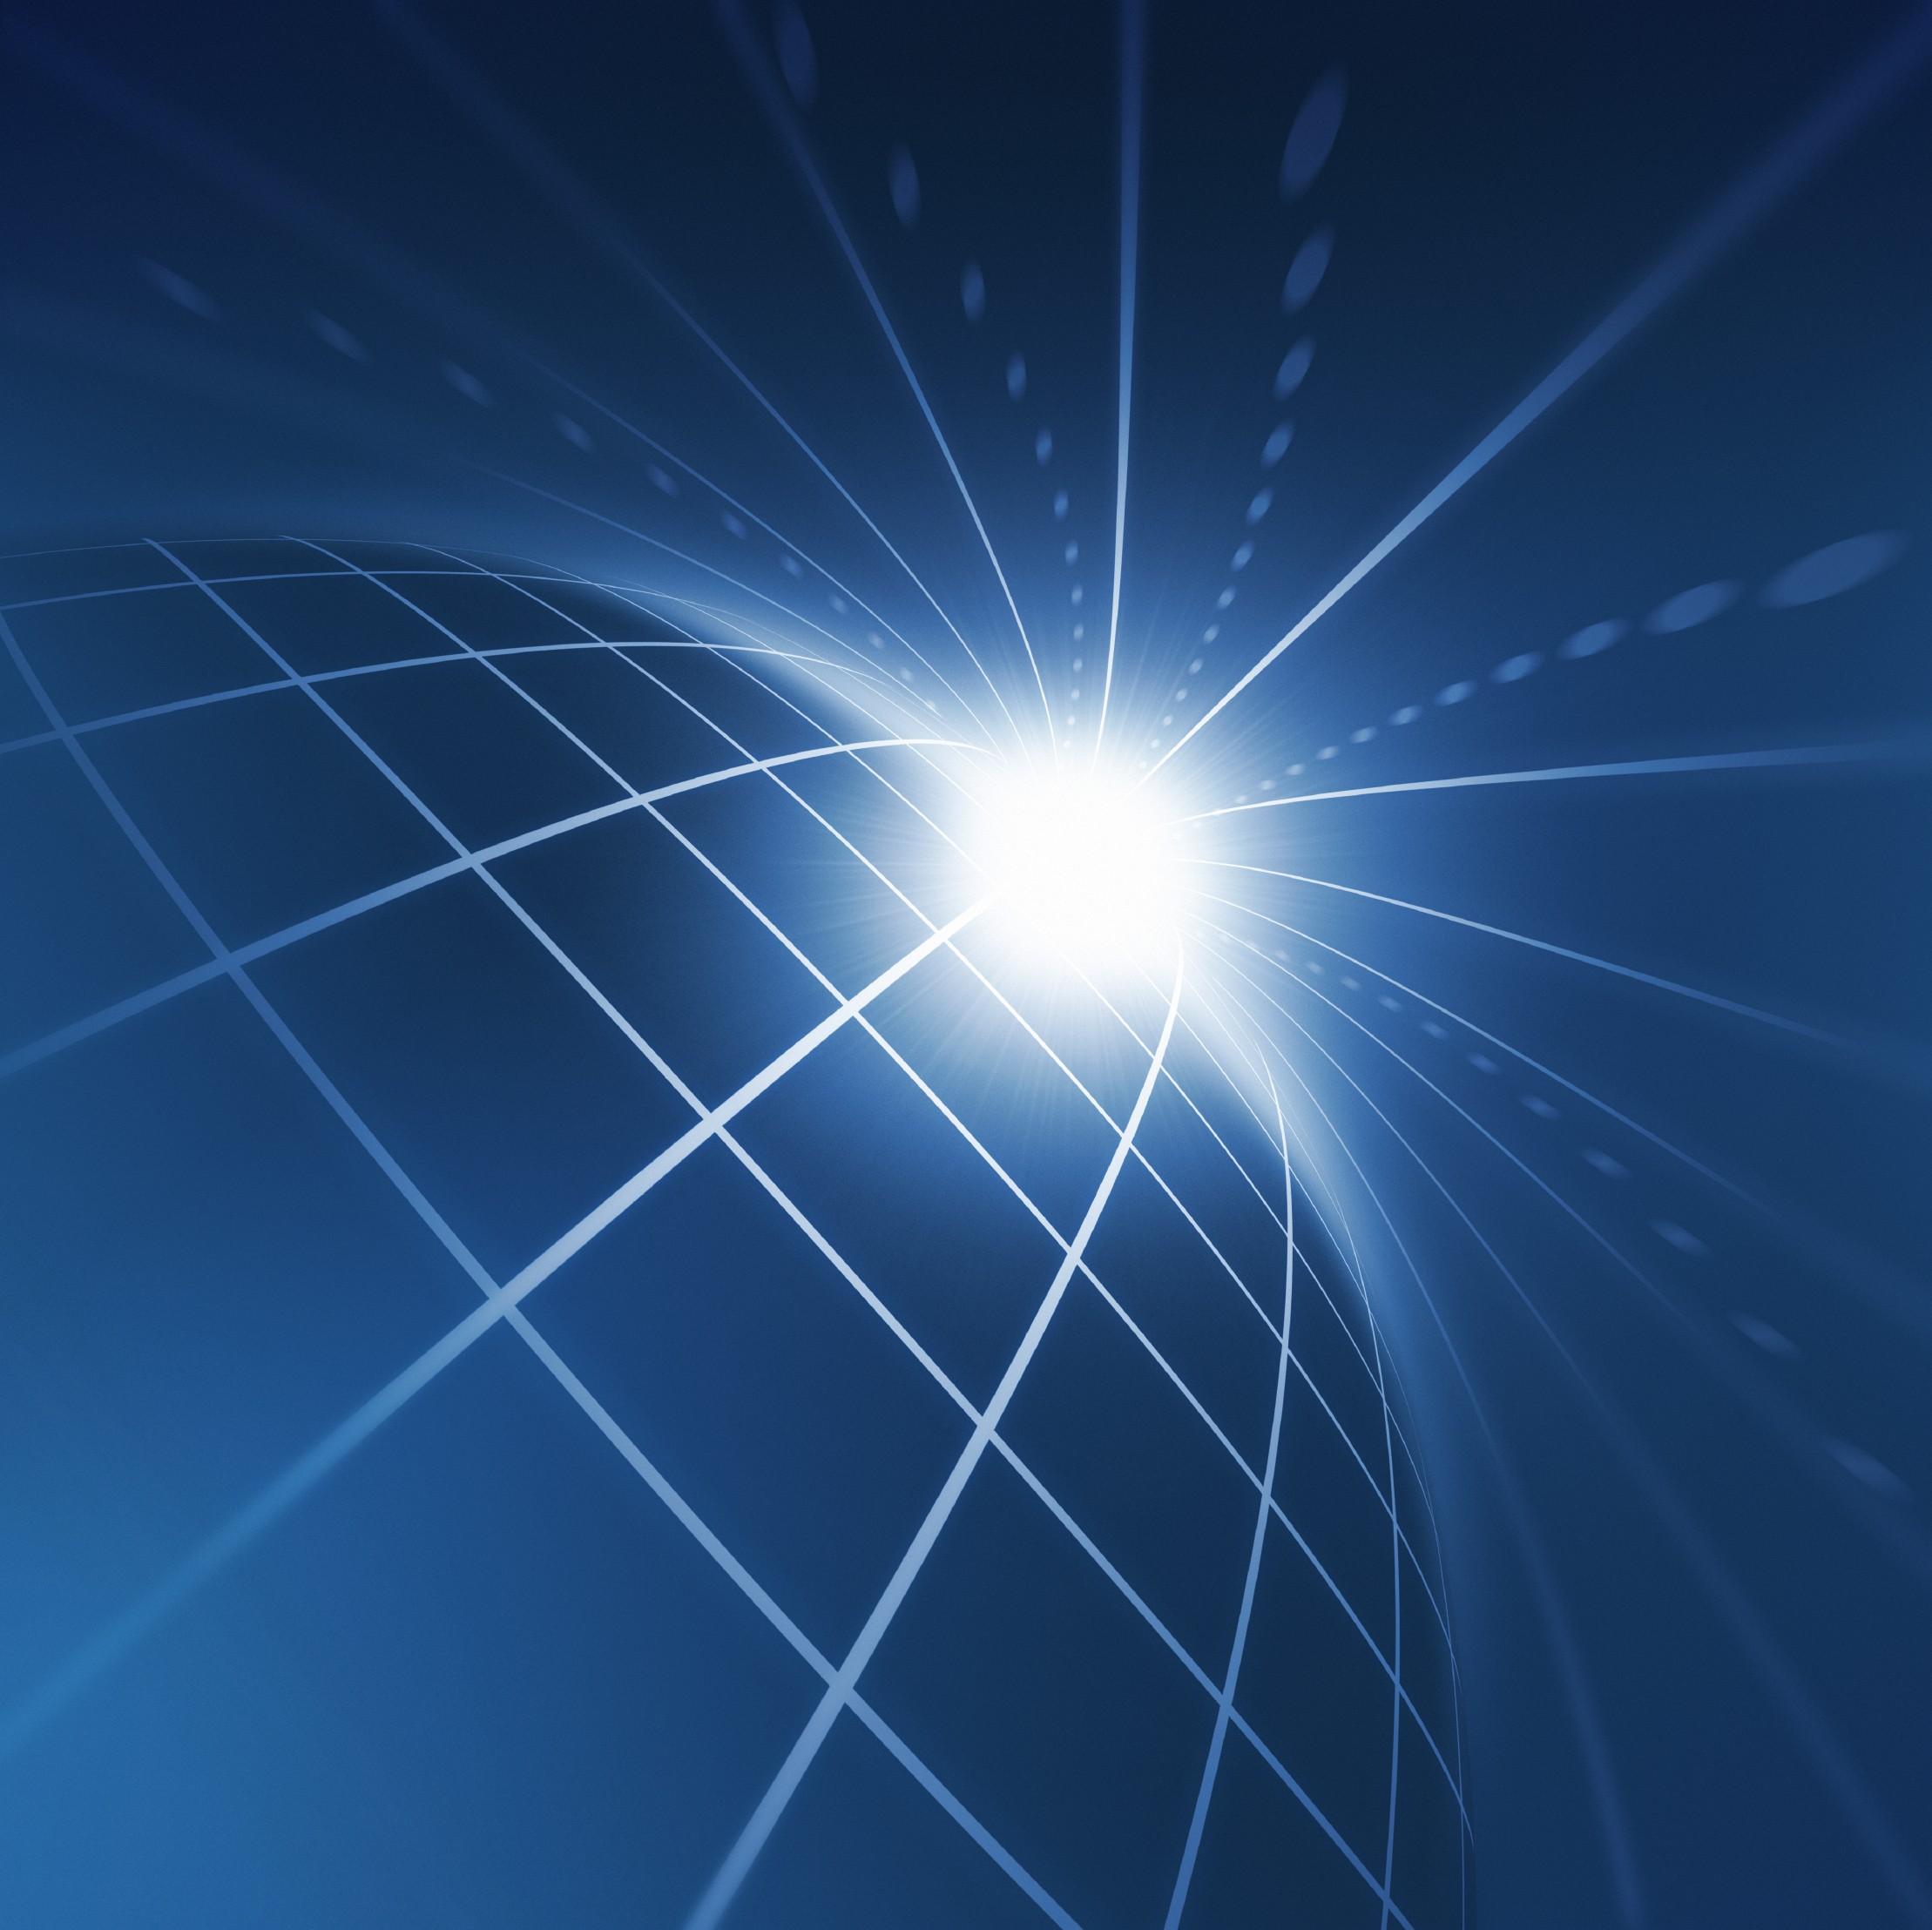 Admirable Wiring By Wall Inc Linkedin Wiring Digital Resources Bemuashebarightsorg